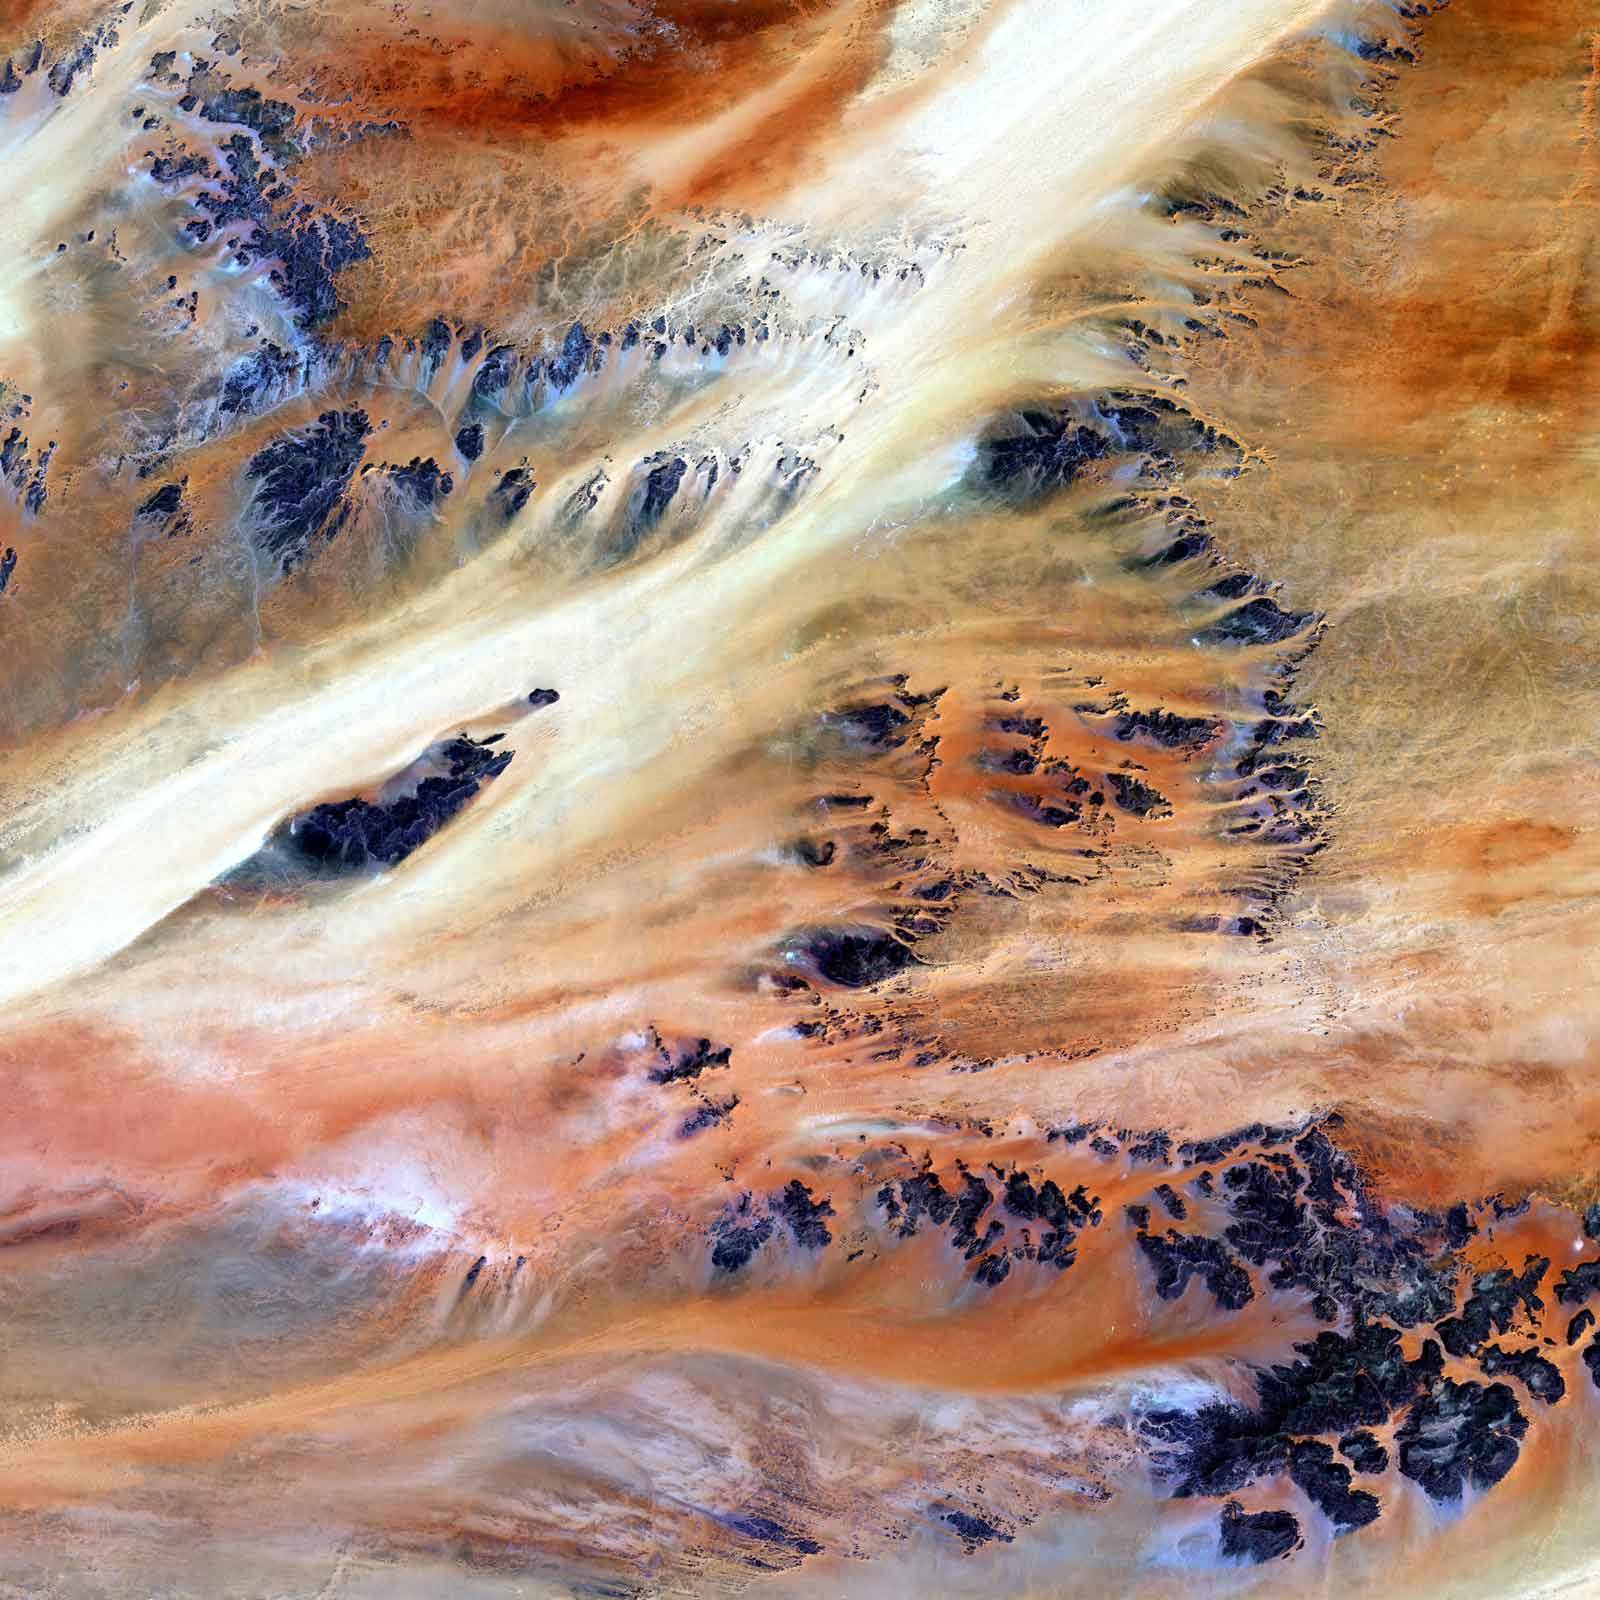 rocky outcroppings of Sahara Desert landscape